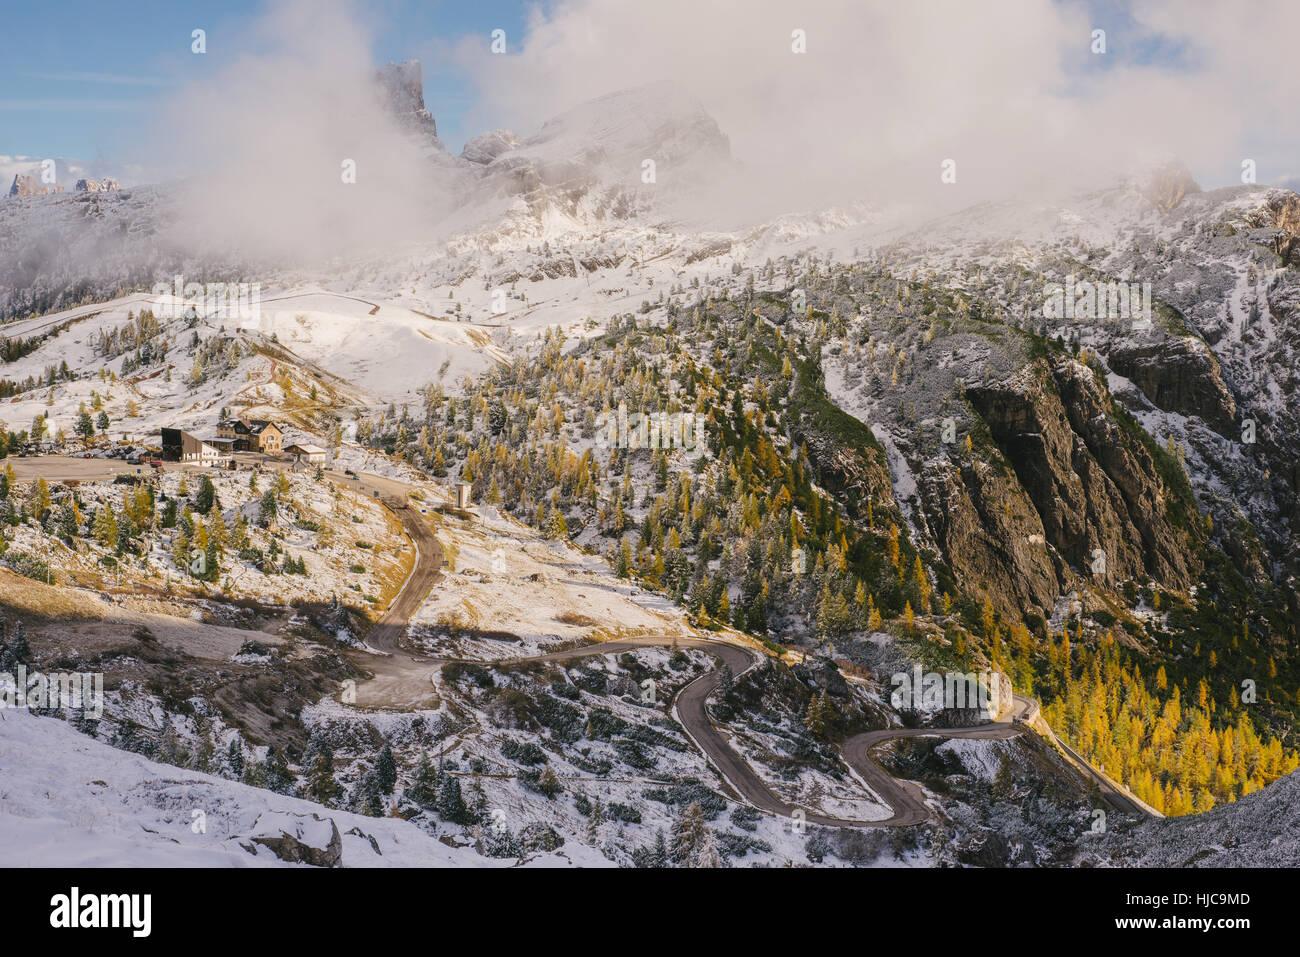 Le Tyrol du Sud, cols alpins, Italie Banque D'Images